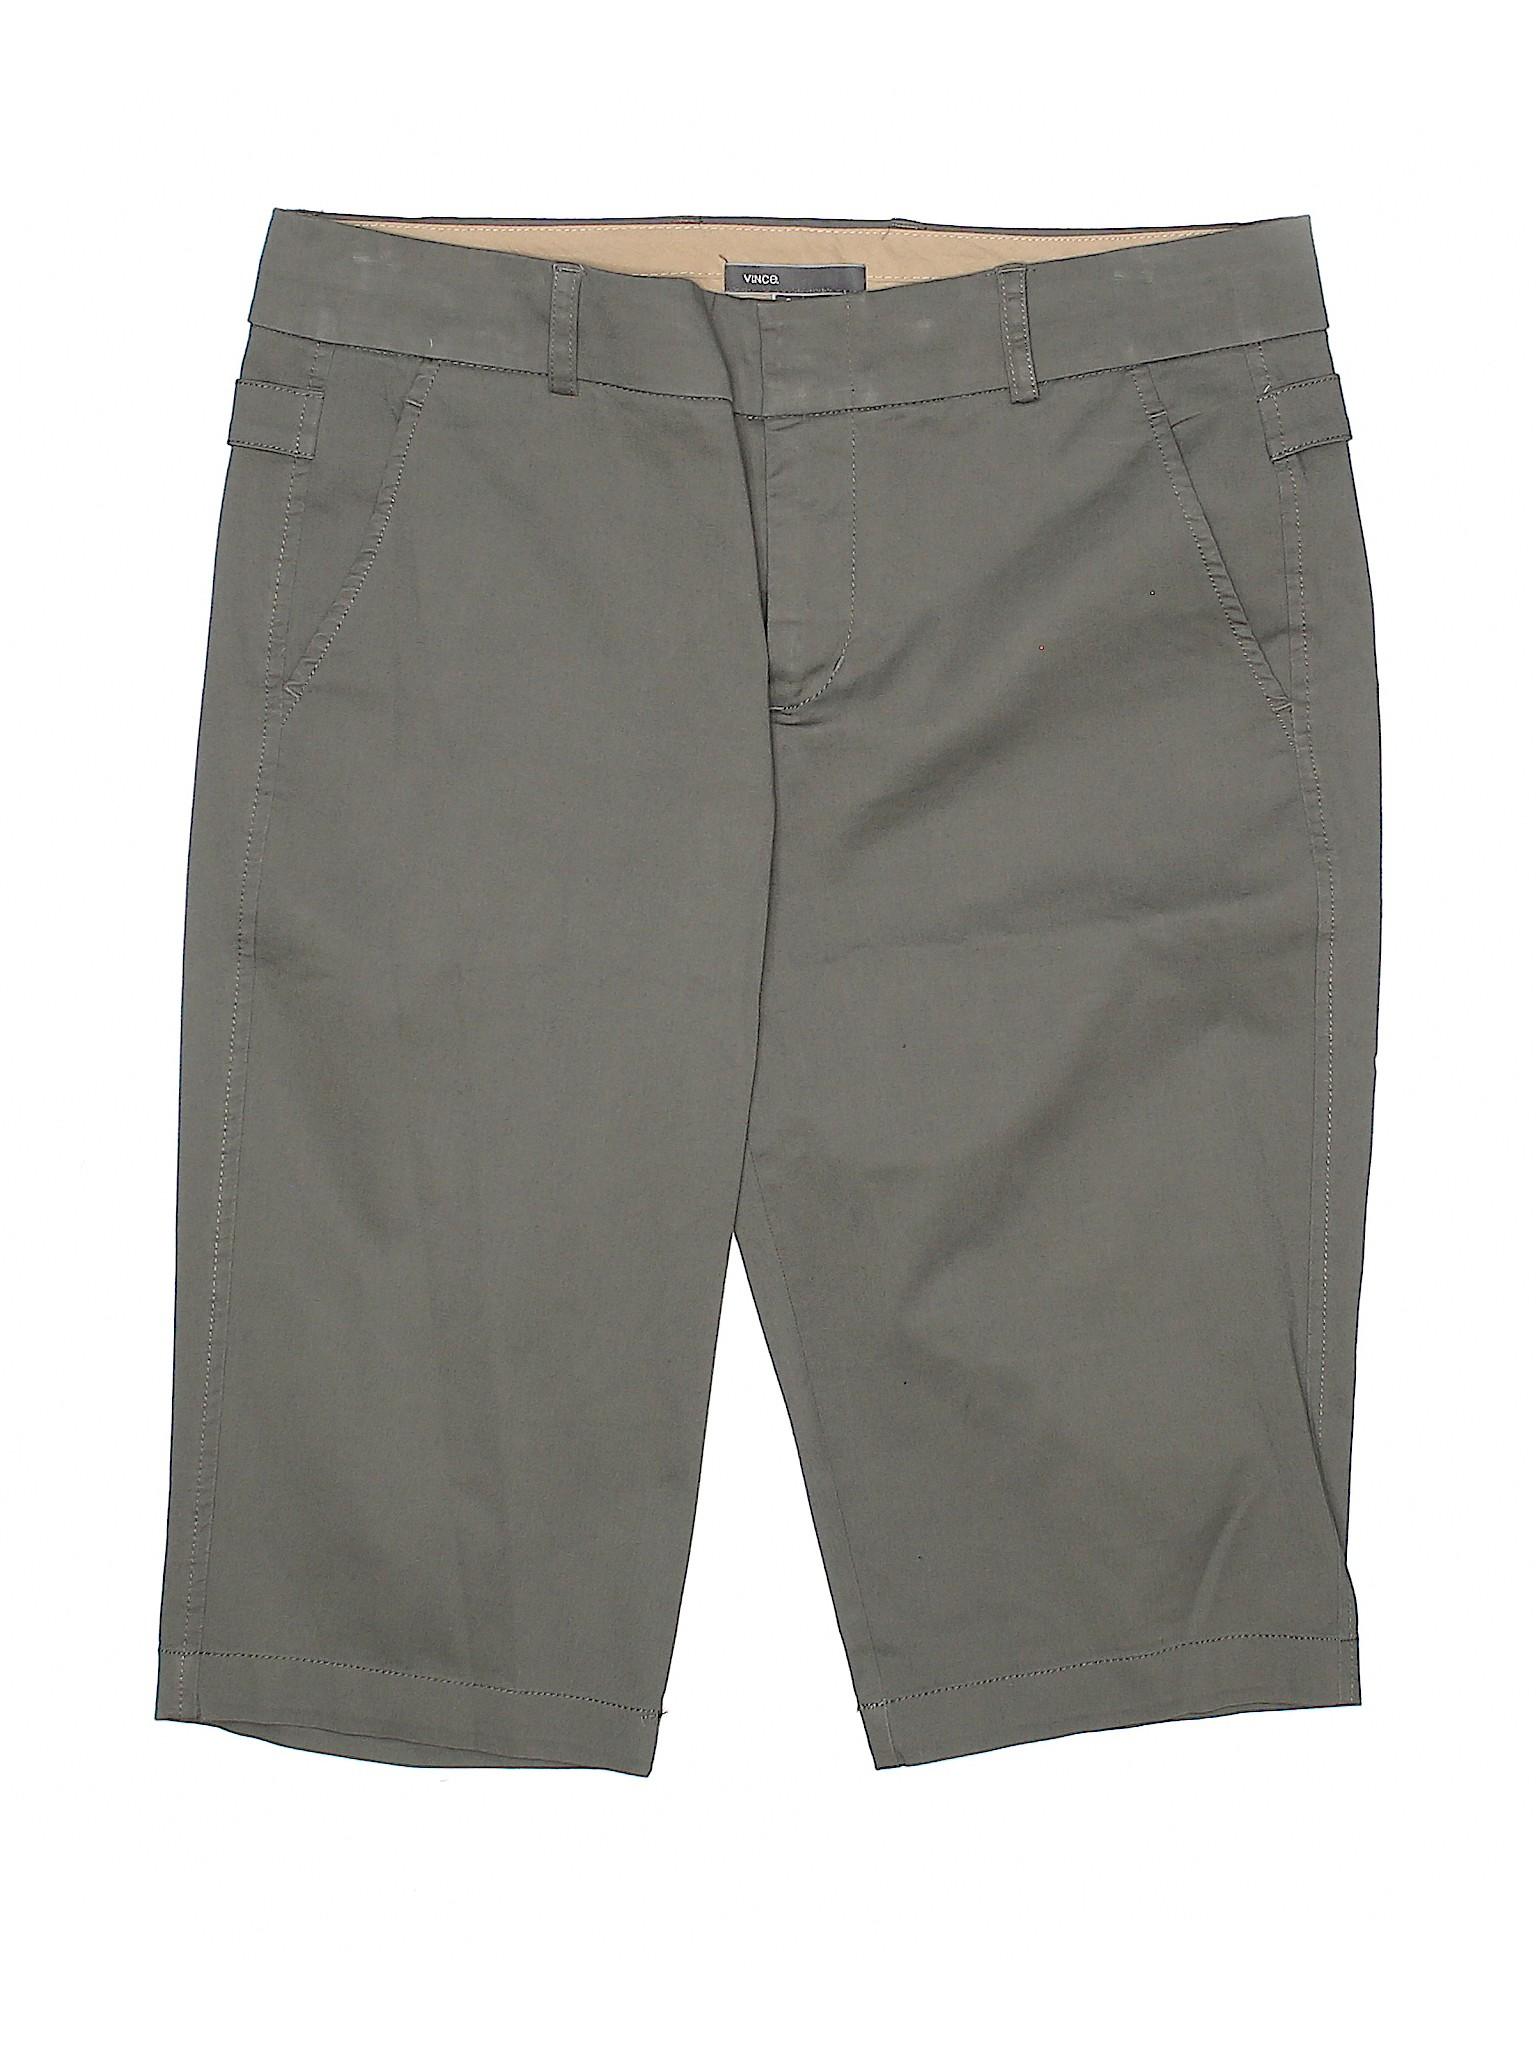 Boutique Vince Khaki Khaki Shorts Shorts Shorts Boutique Boutique Khaki Vince Vince Yx6ZqRT